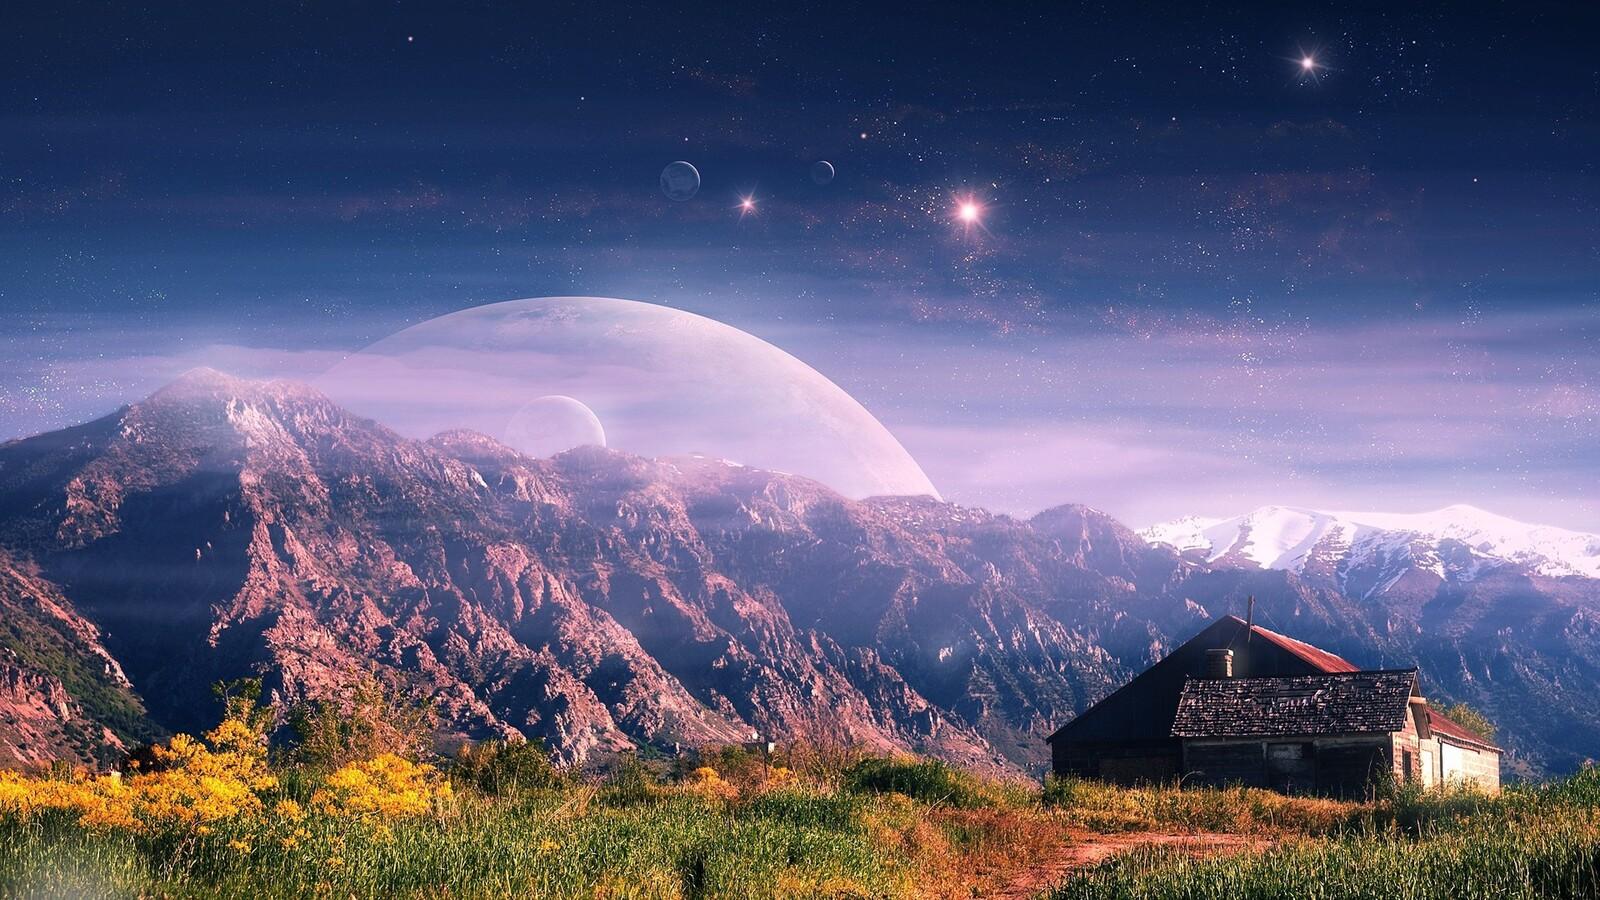 mountain-house-fantasy.jpg